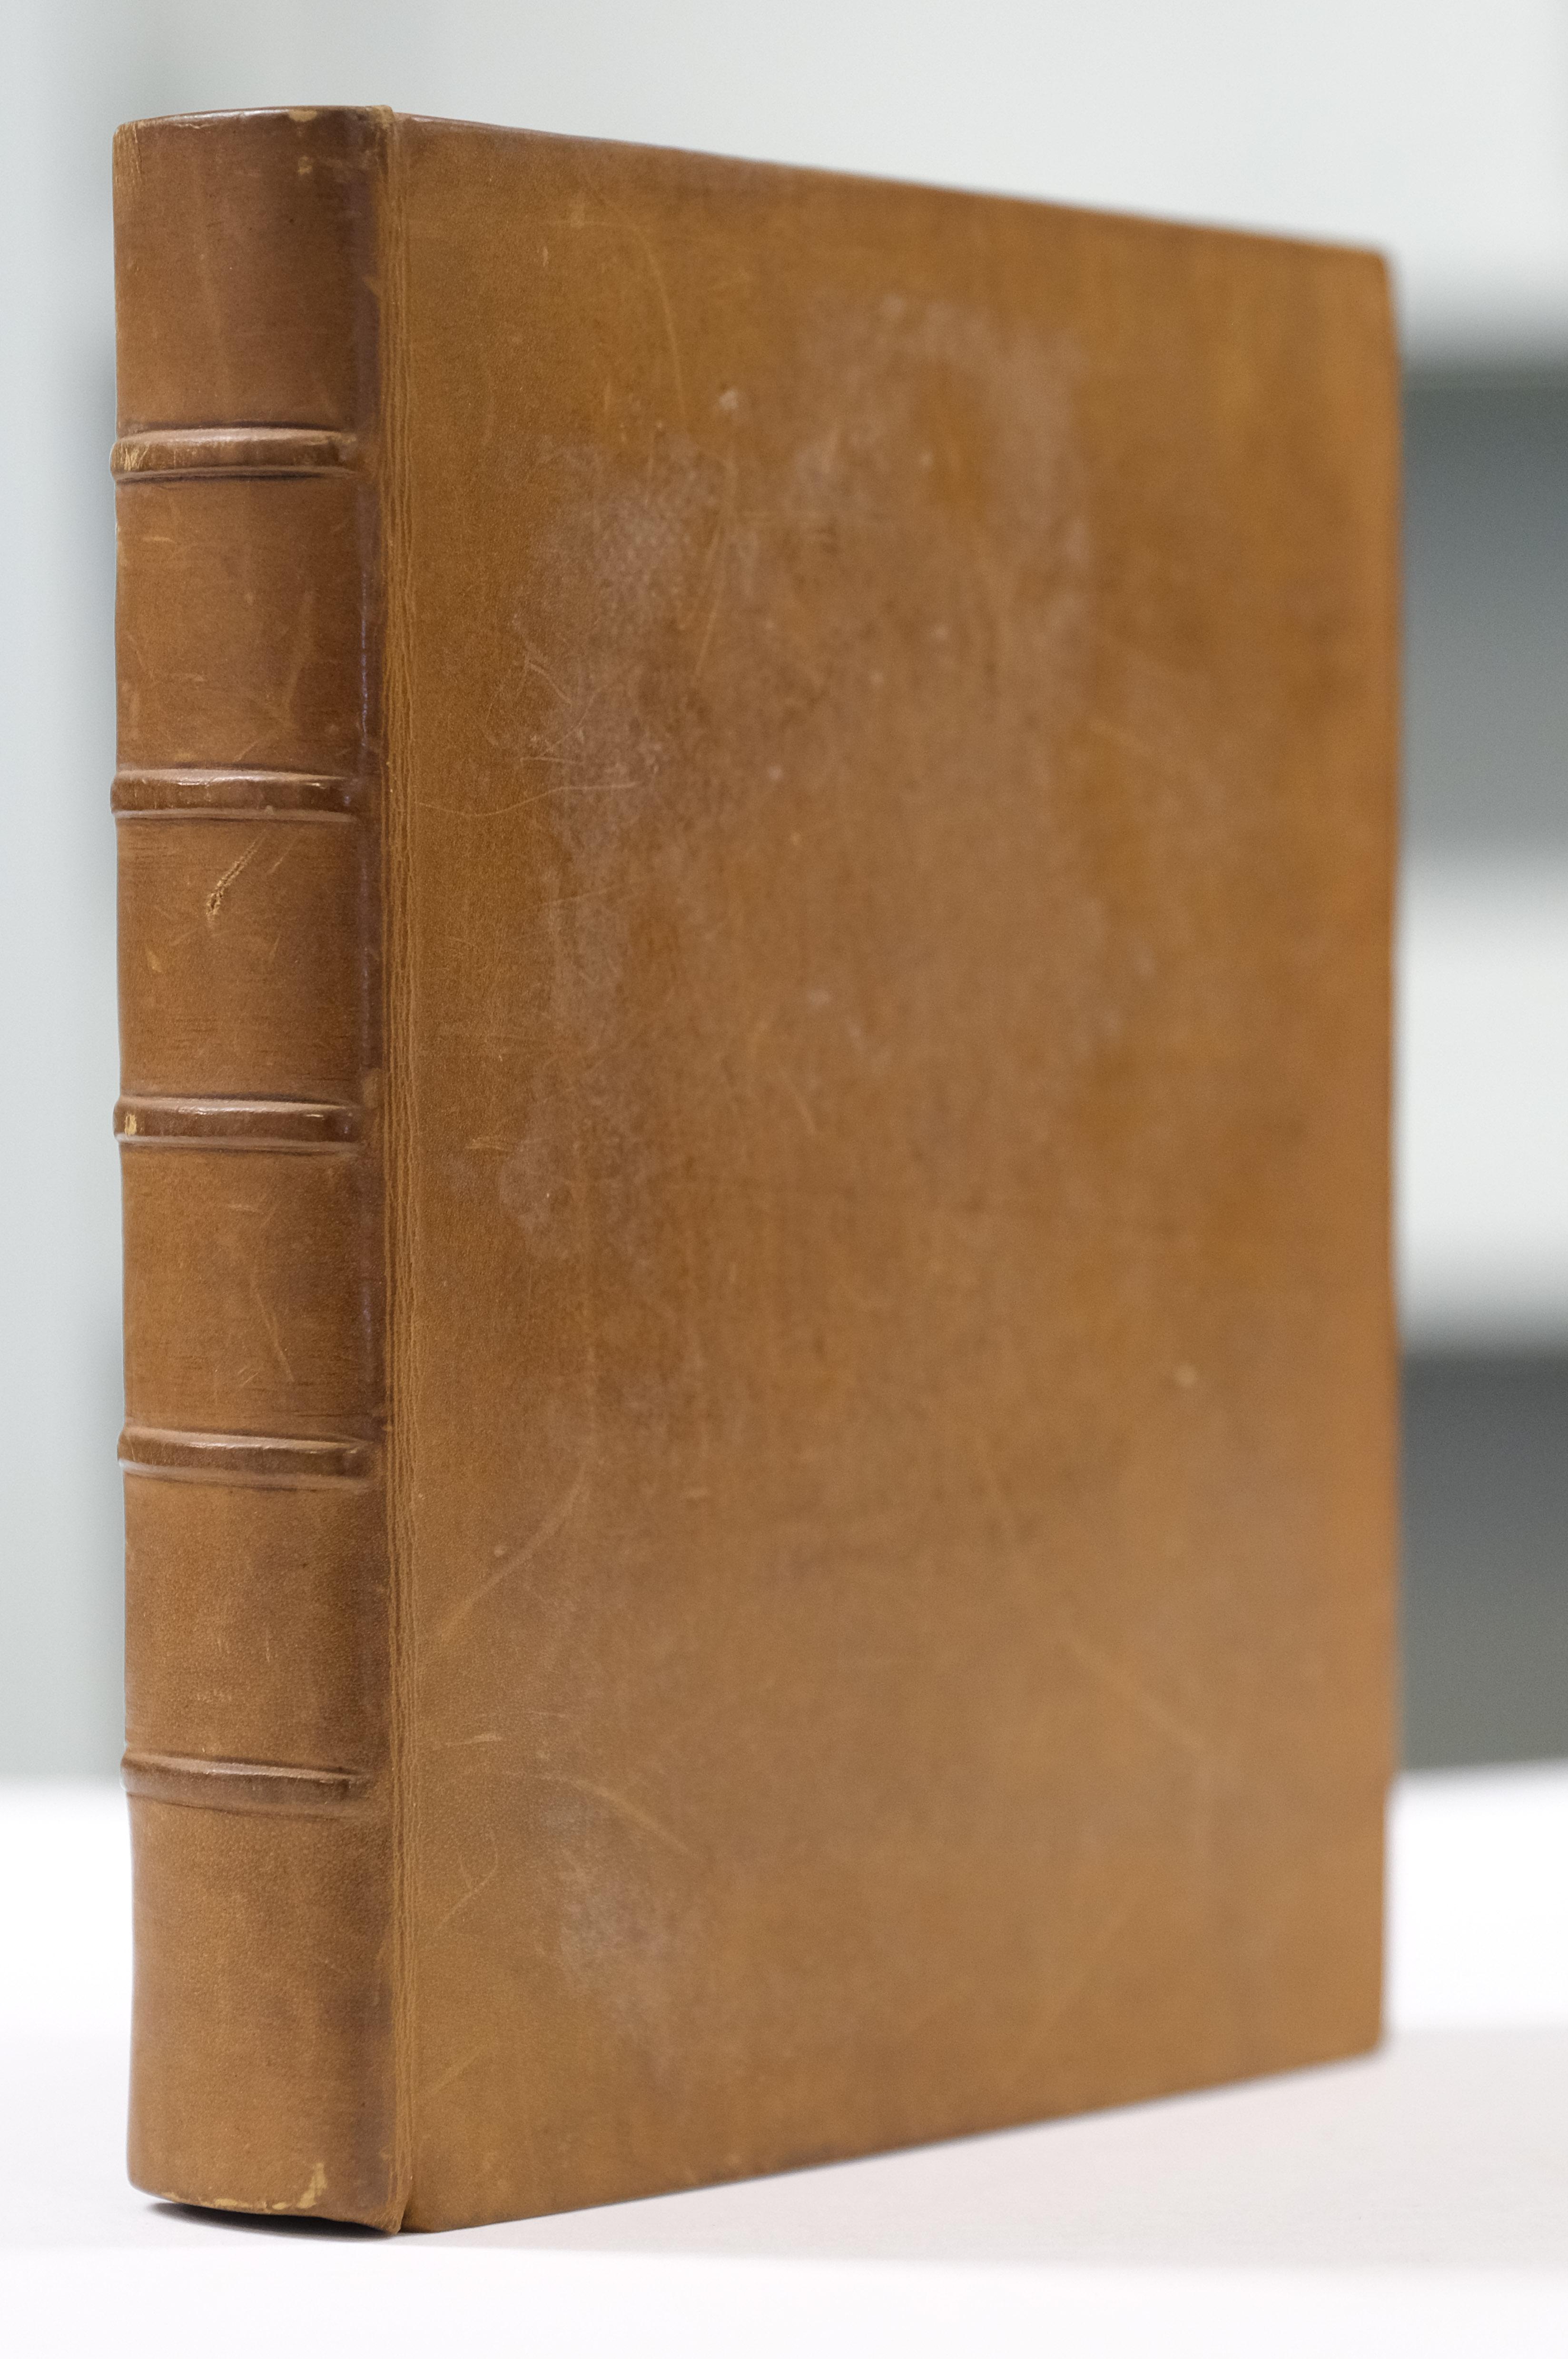 Terence. Terence in English. Fabulae comici facetissimi et elegantissimi poetæ Terentii, 1641